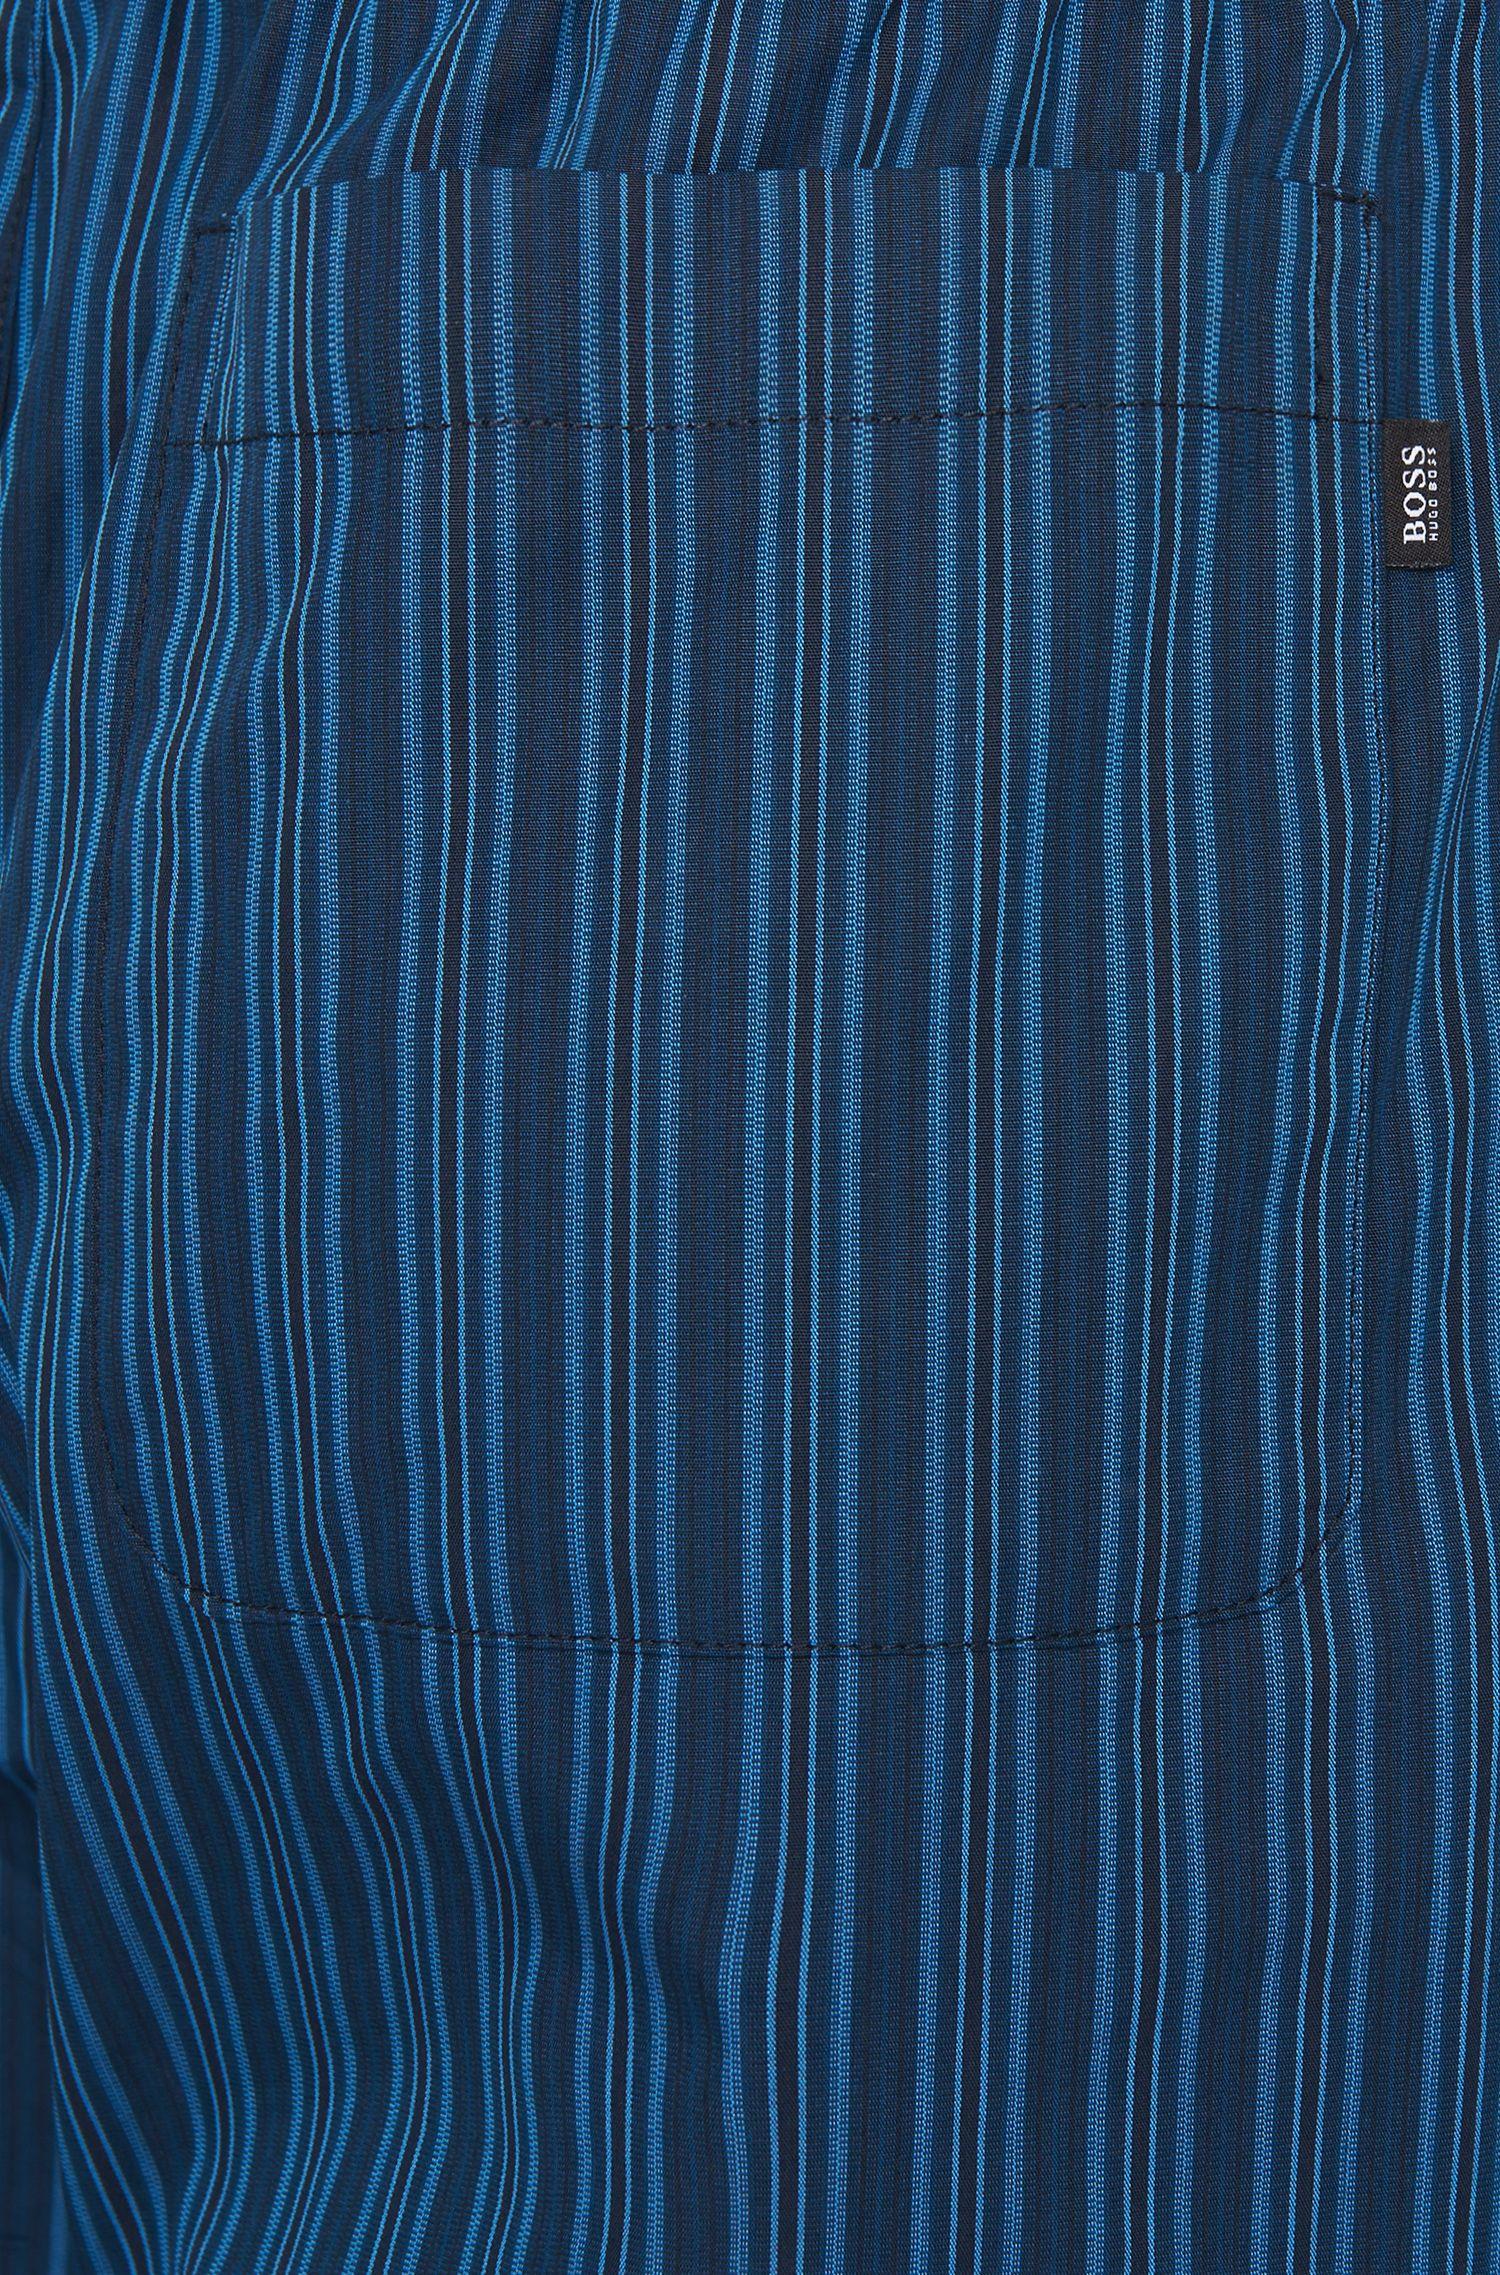 Gestreifte Pyjama-Hose aus Baumwolle mit Tunnelzug: 'Long Pant CW'